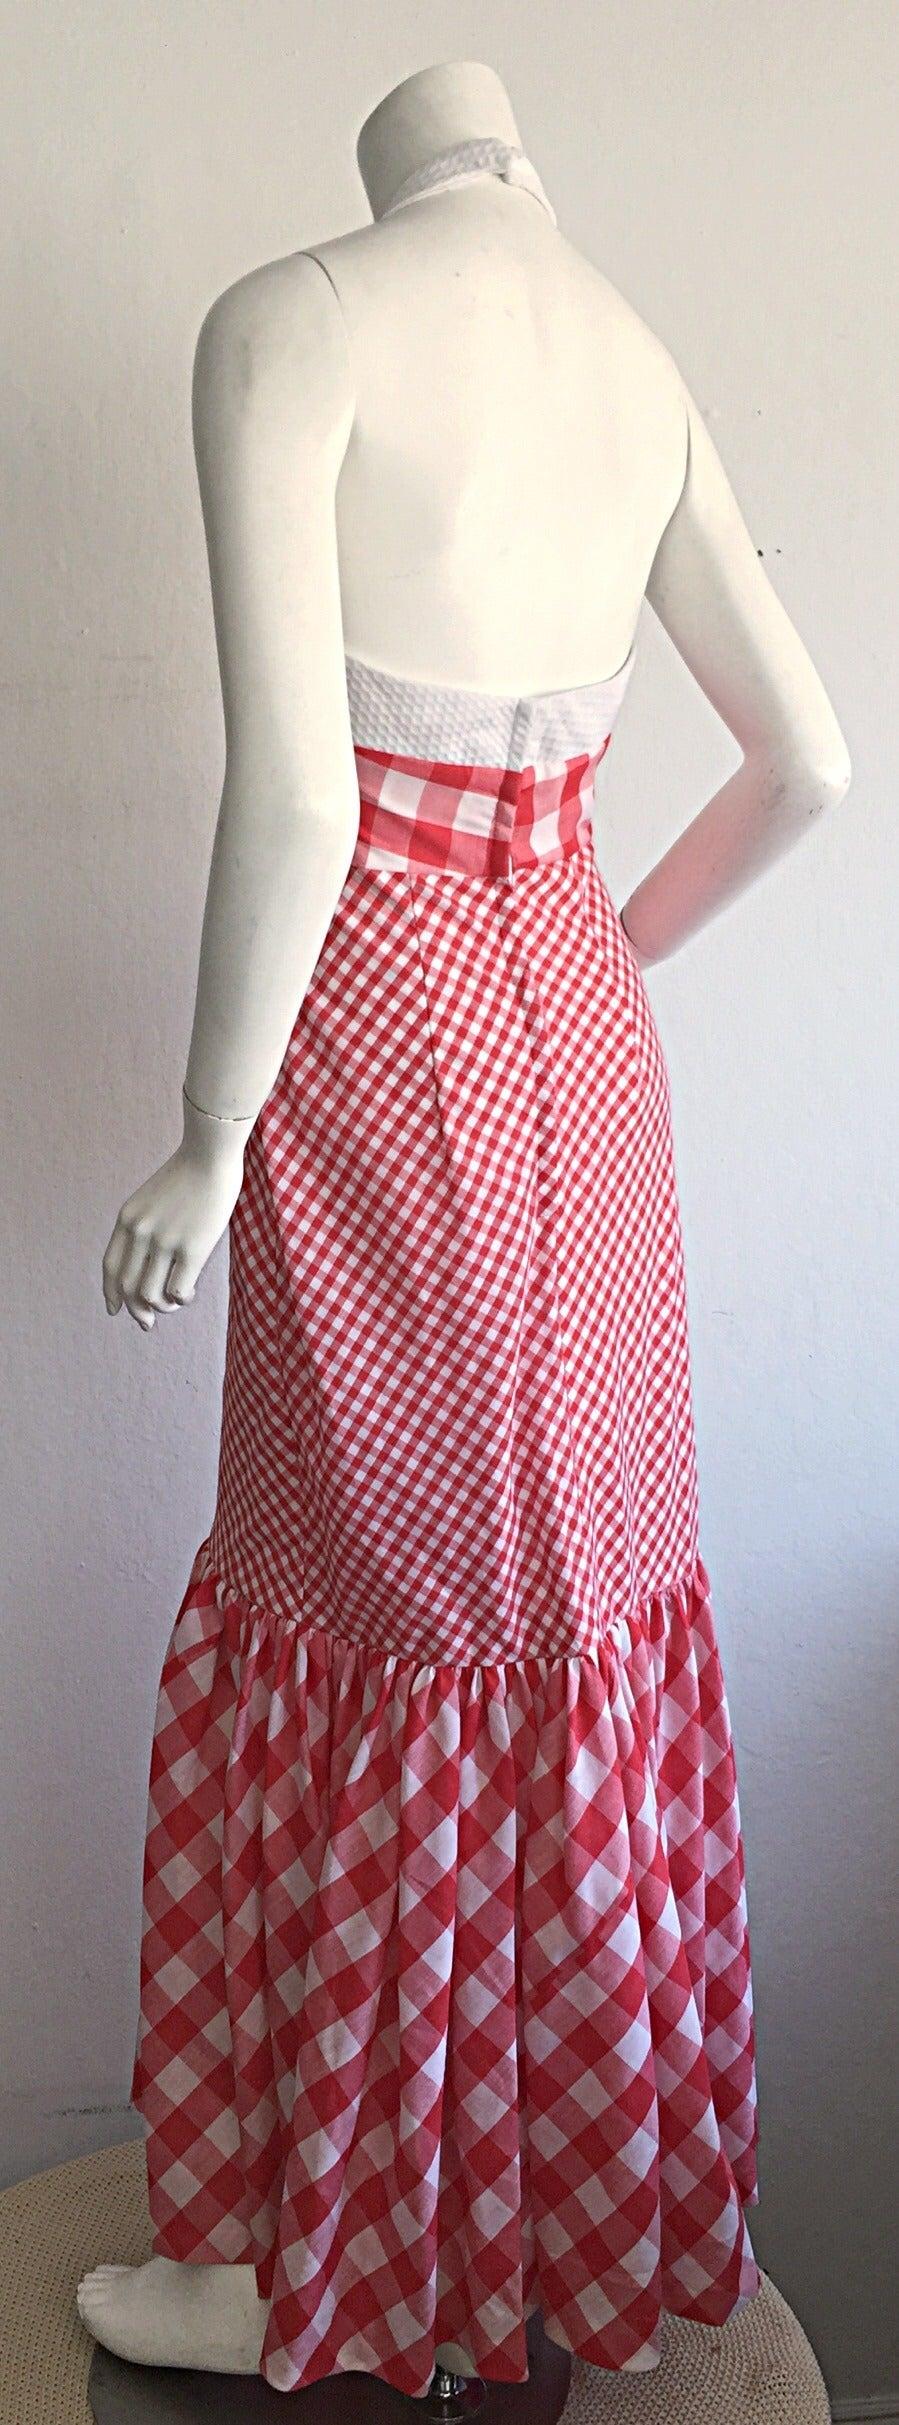 Vintage 1970s Red + White ' Picnic Table ' Plaid Cotton Halter Maxi Dress For Sale 3